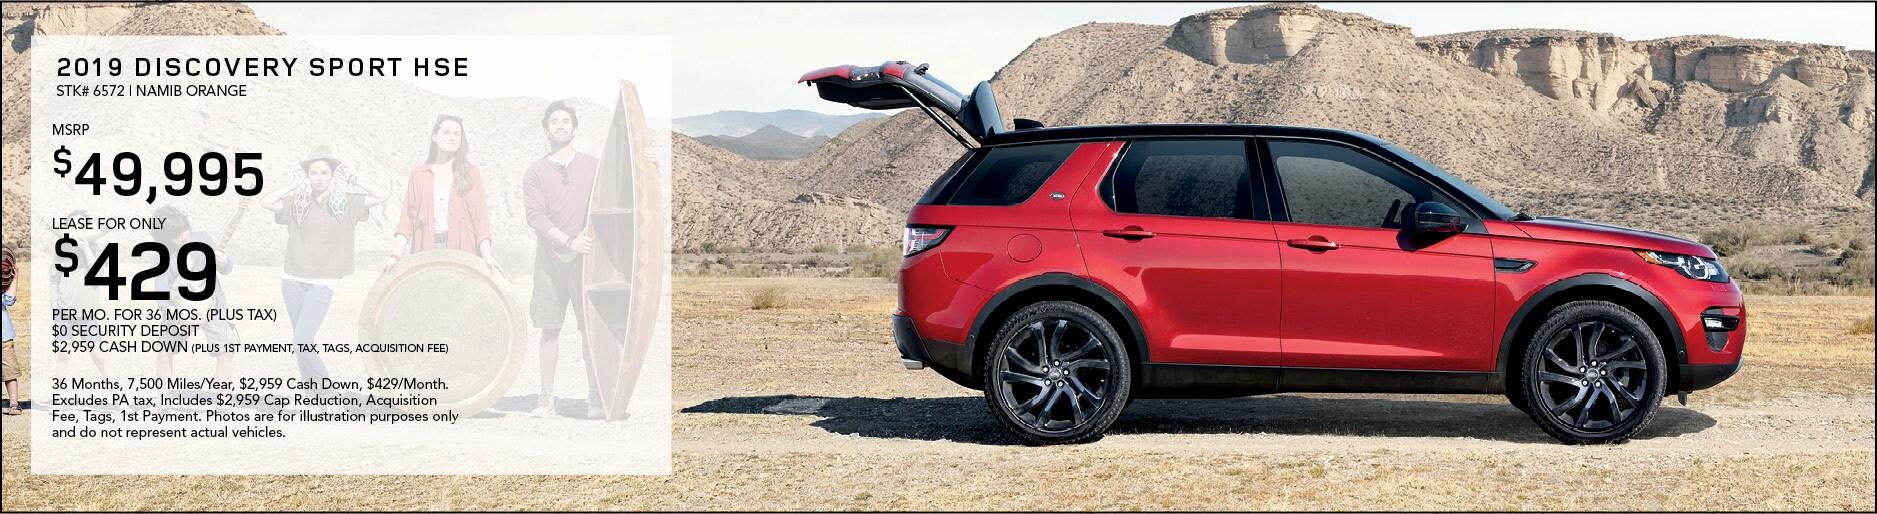 Land Rover Harrisburg New Land Rover Dealership In Harrisburg Pa